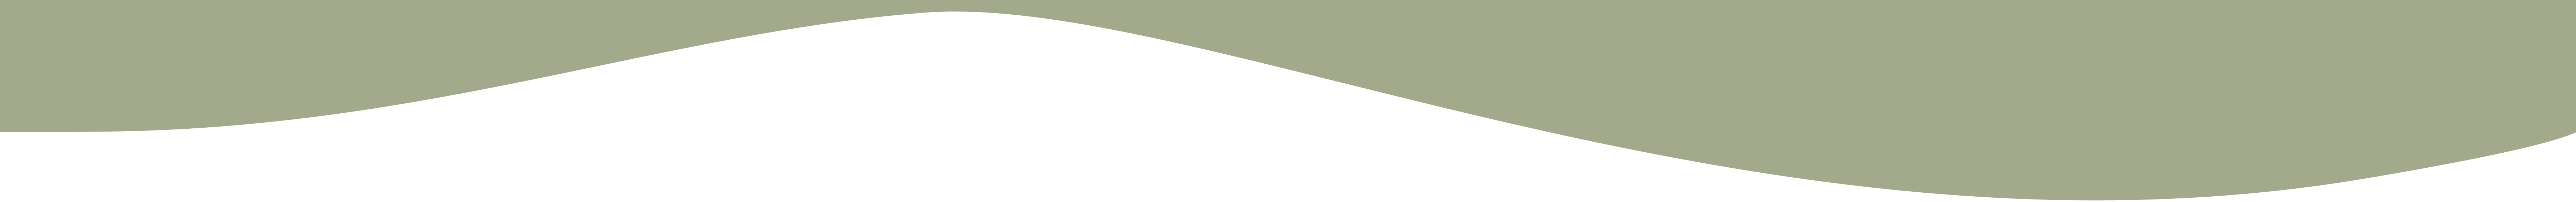 wave-banner-0